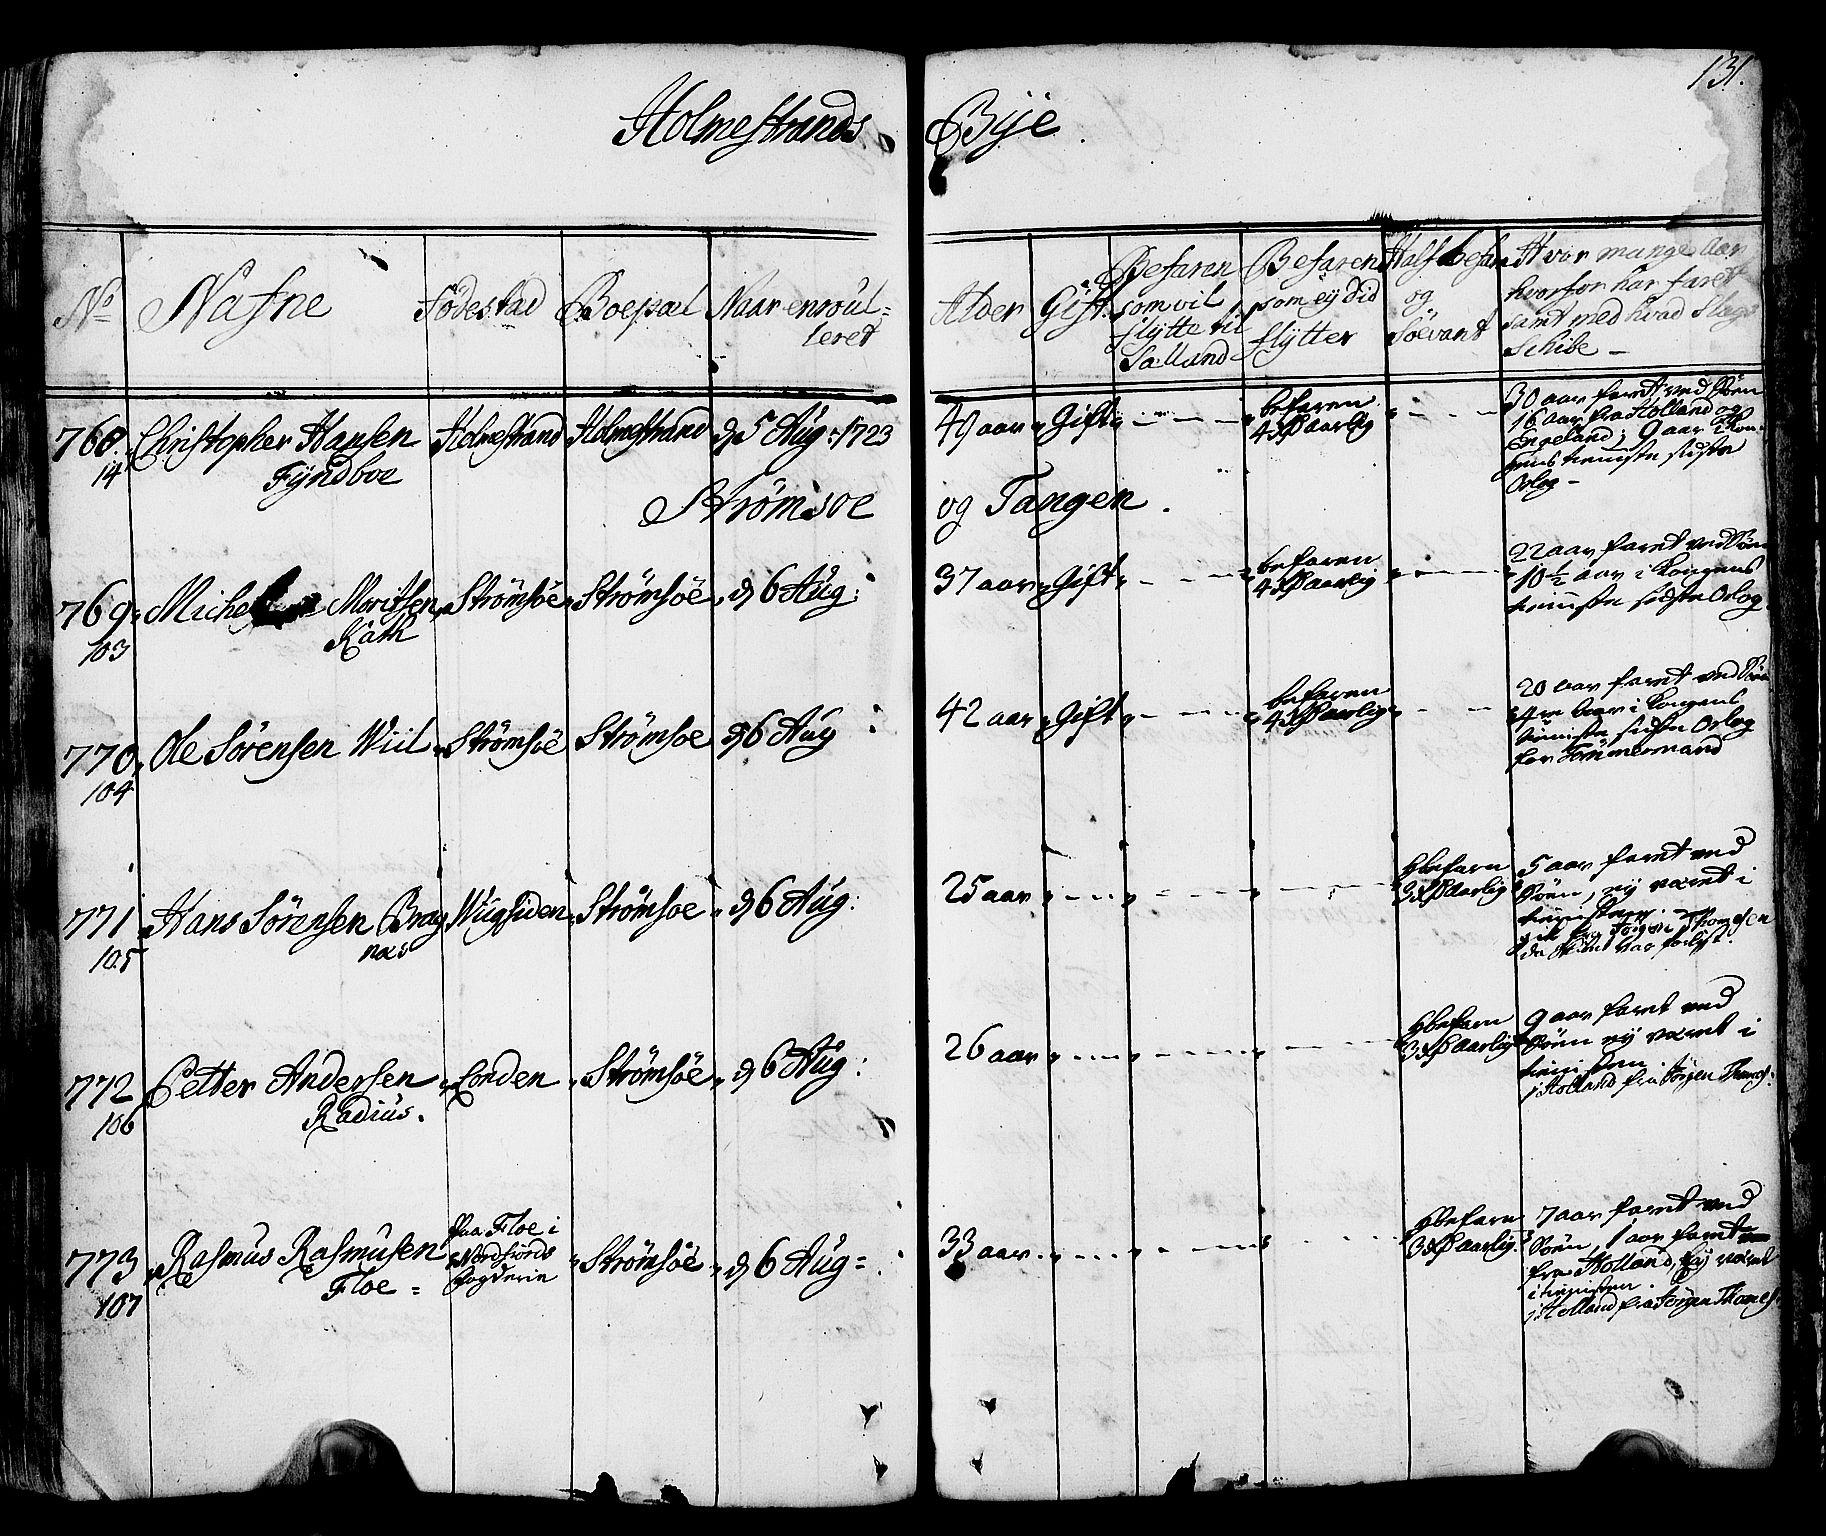 SAKO, Drammen innrulleringsdistrikt, F/Fa/L0002: Hovedrulle, 1723-1726, s. 132